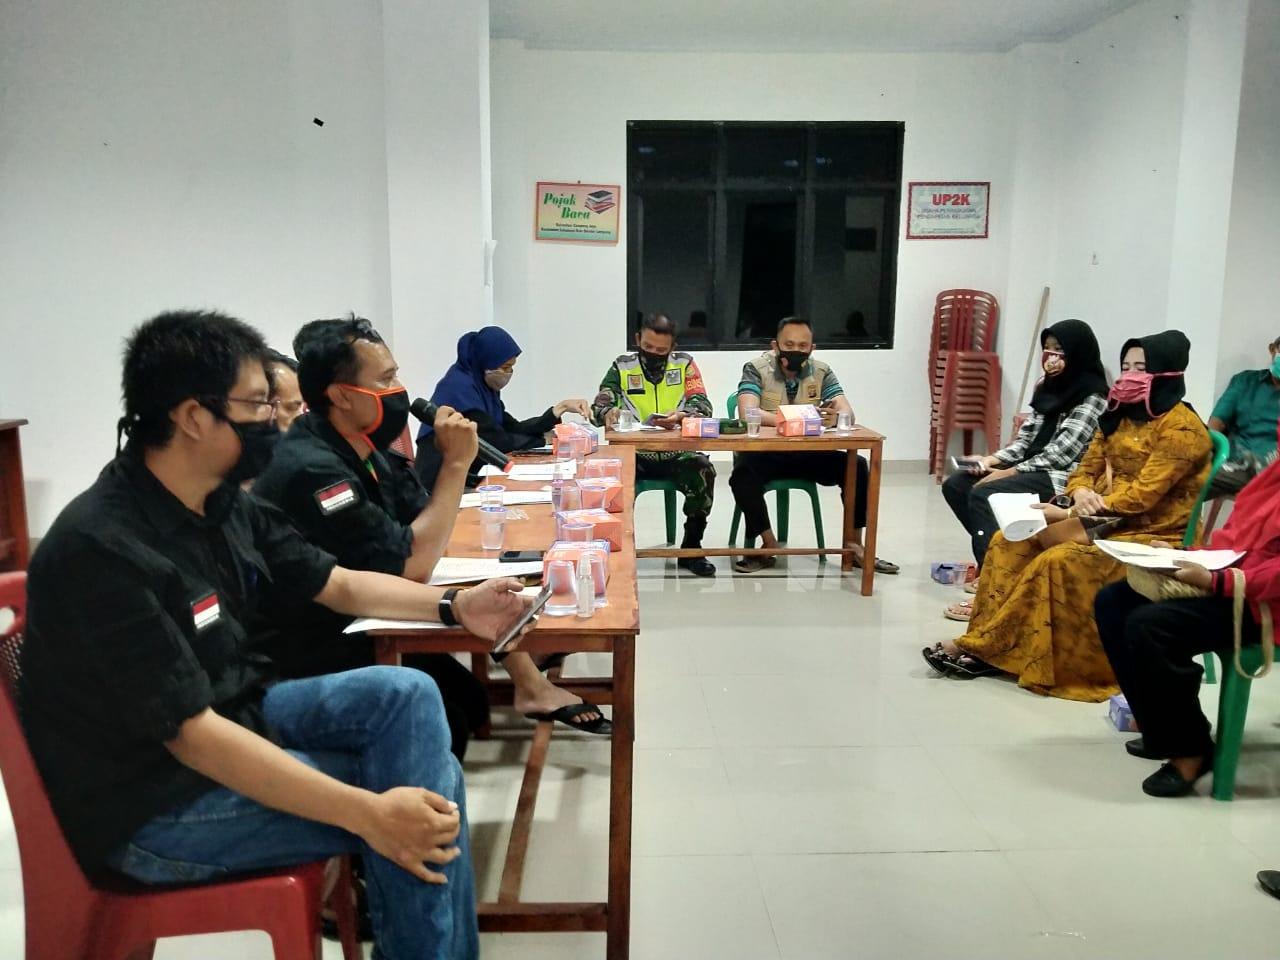 Babinsa Kelurahan Campang Jaya Koramil 410-01/Panjang Kodim 0410/KBL Sertu Agus triawan menghadiri rapat pleno DPSHP